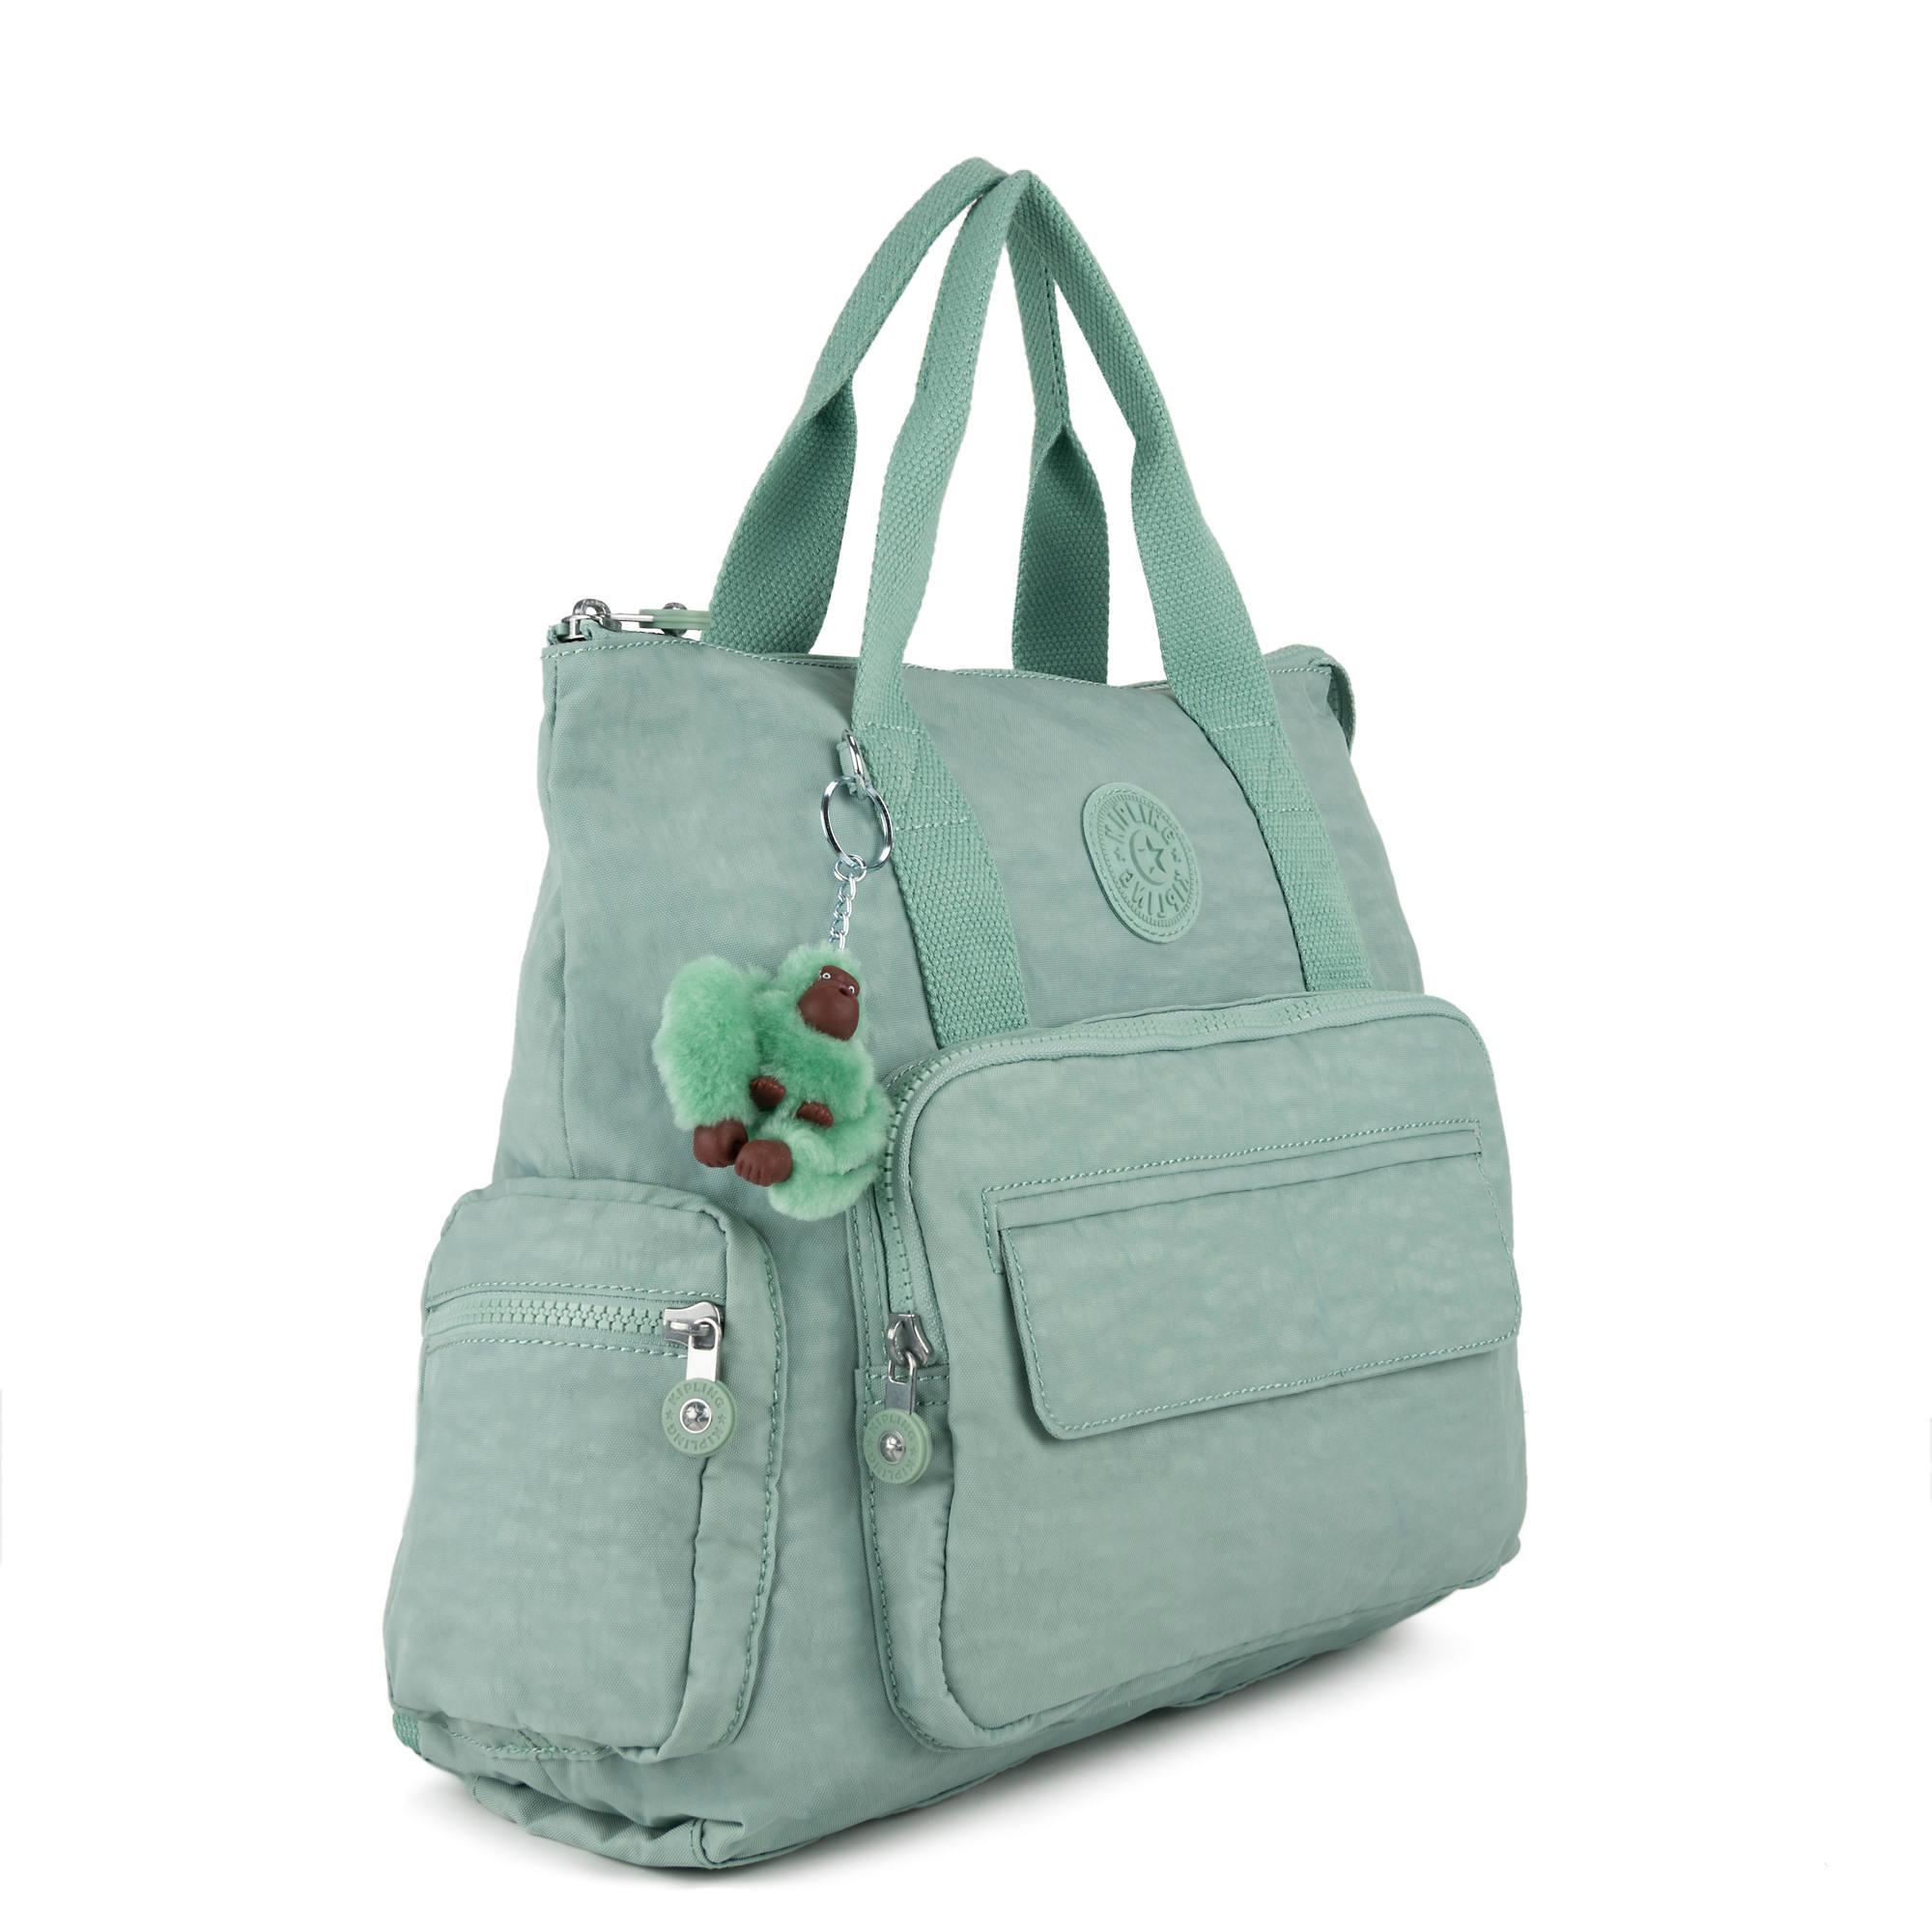 Kipling-Alvy-2-In-1-Convertible-Tote-Bag-Backpack miniatura 20